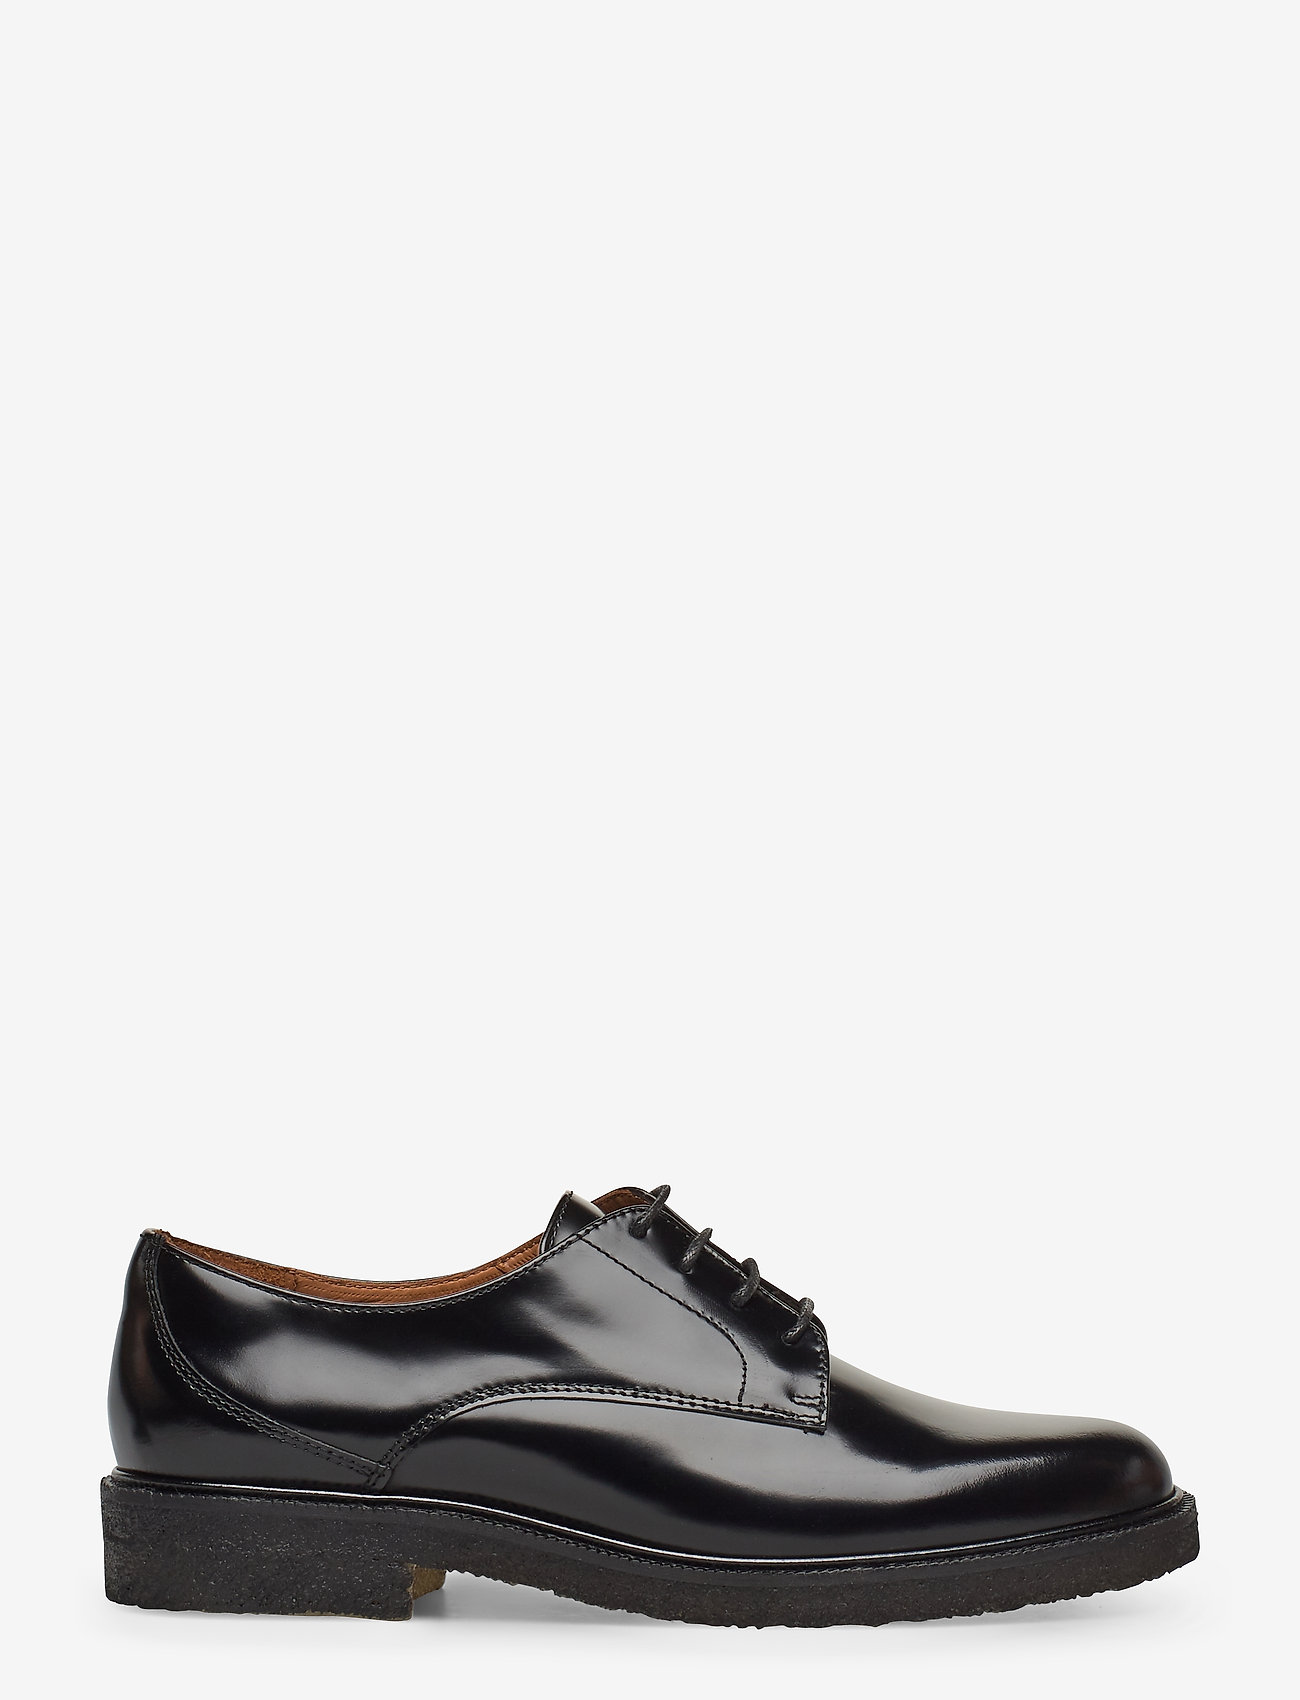 Billi Bi - Shoes 4717 - buty sznurowane - black polido  900 - 1